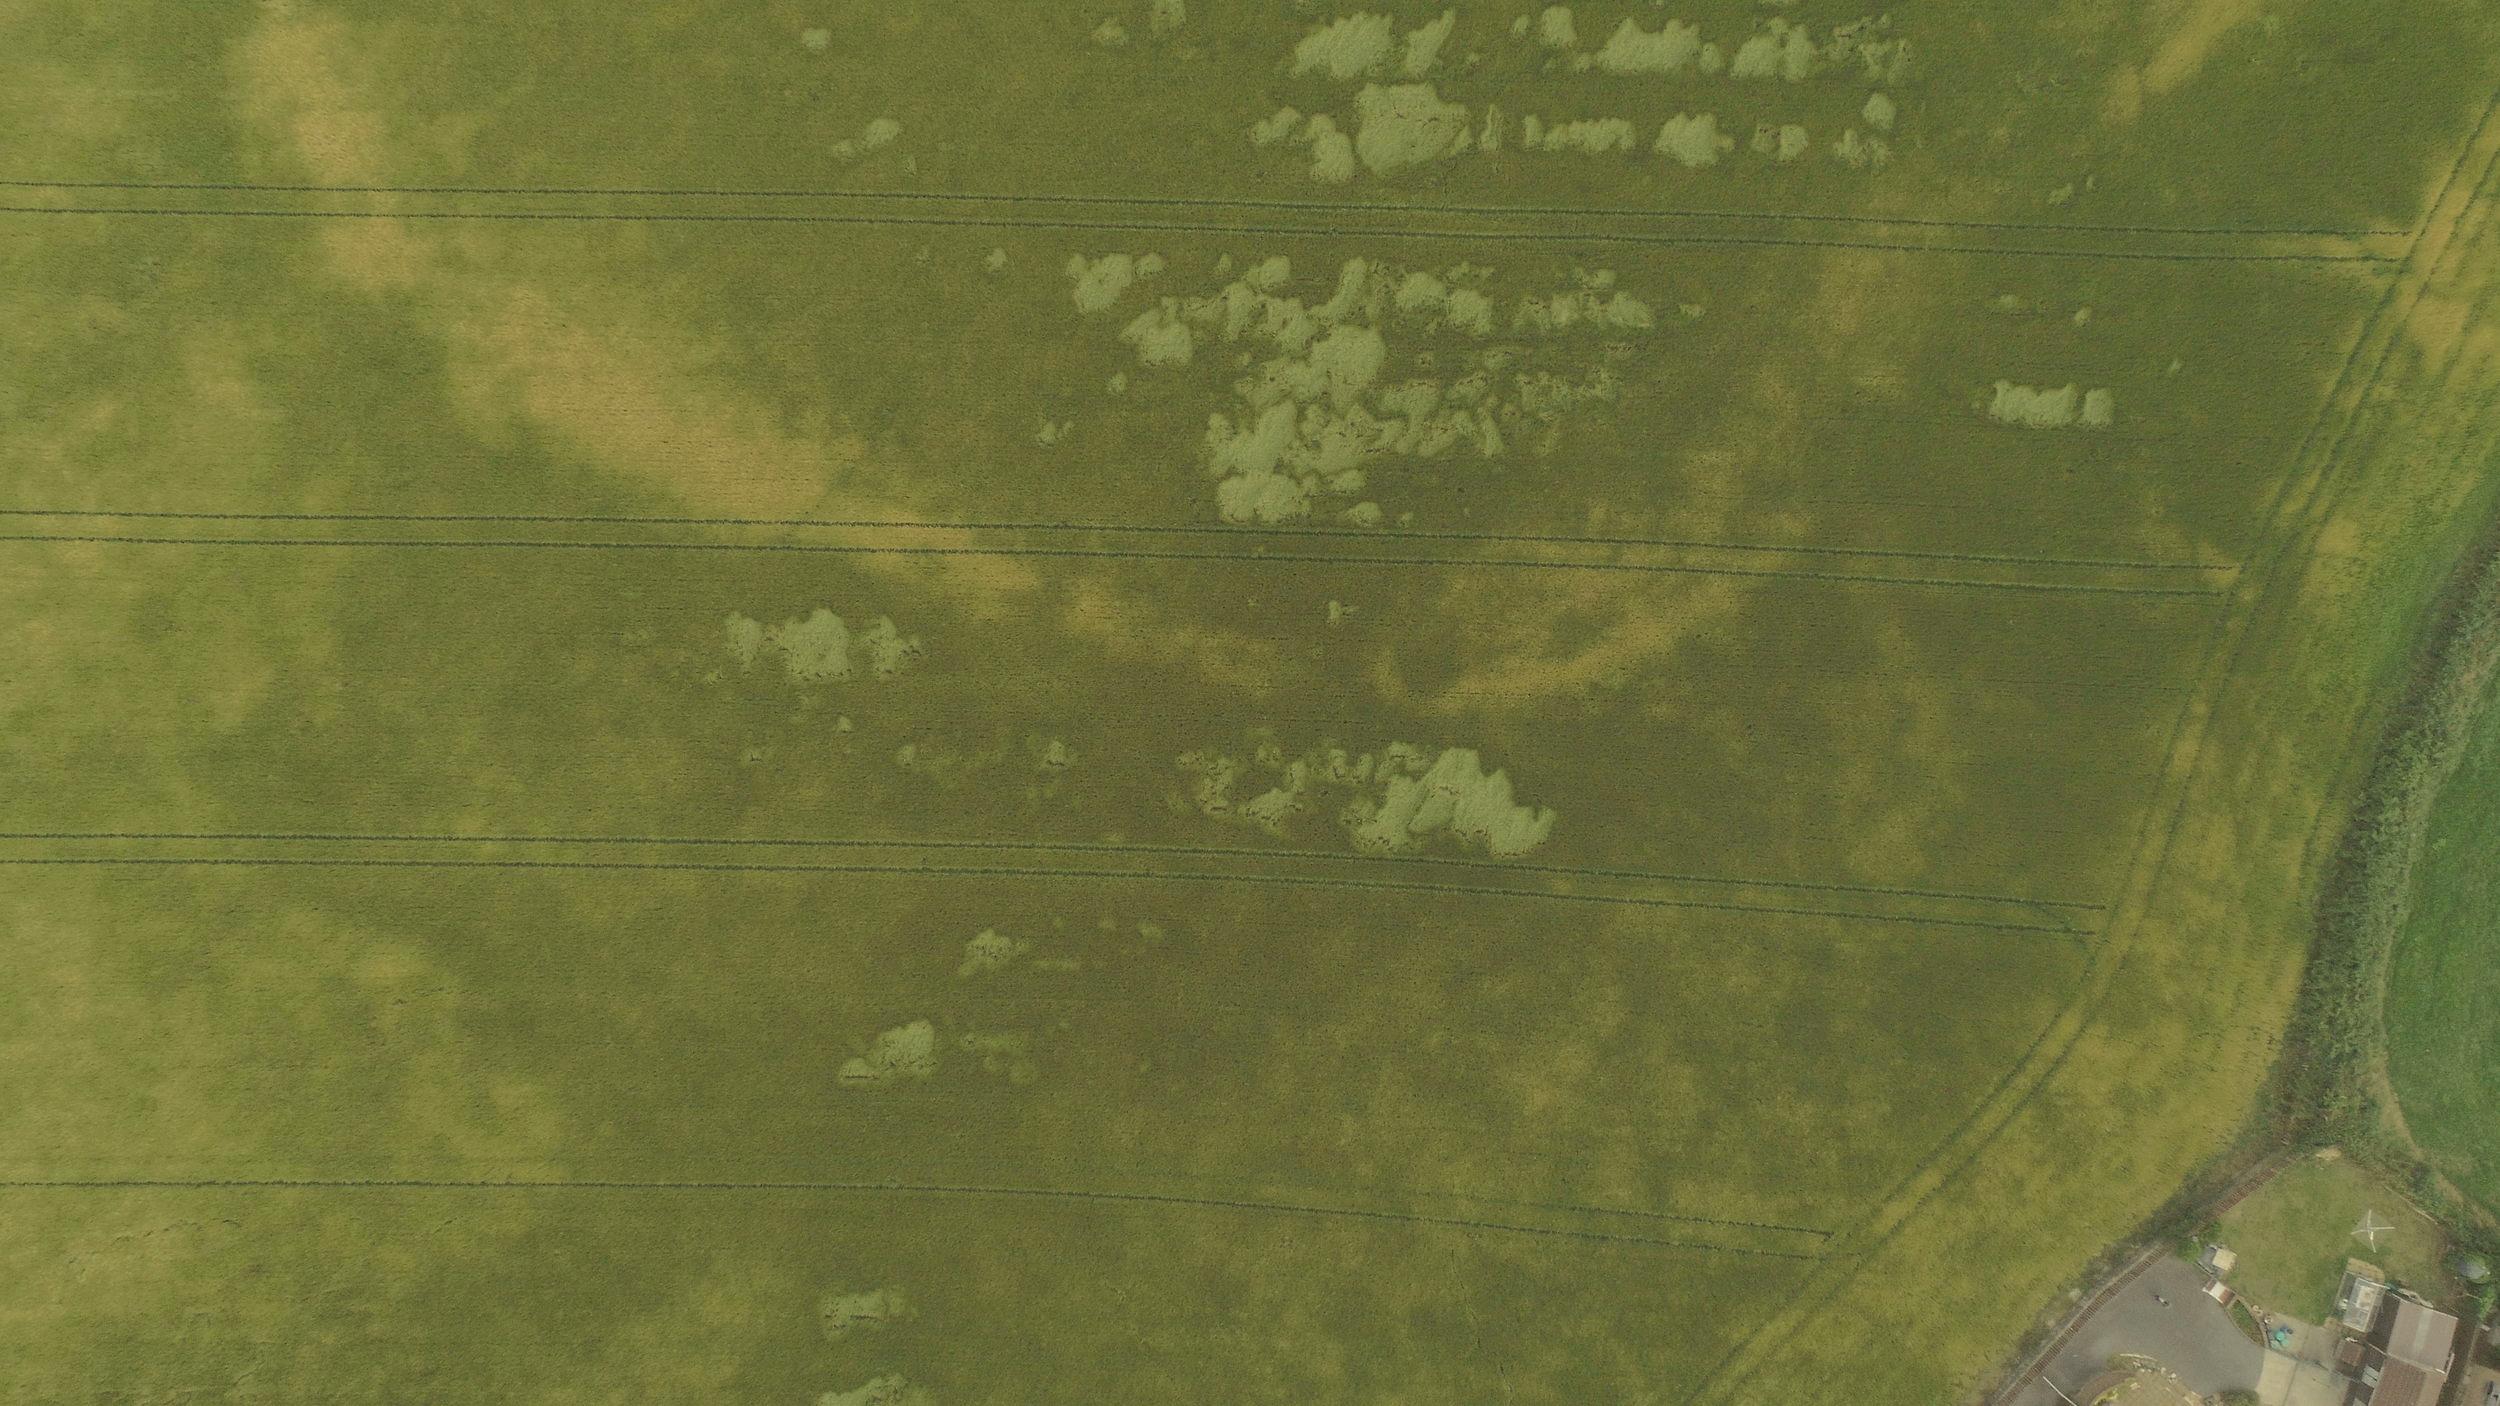 Field near the Border.